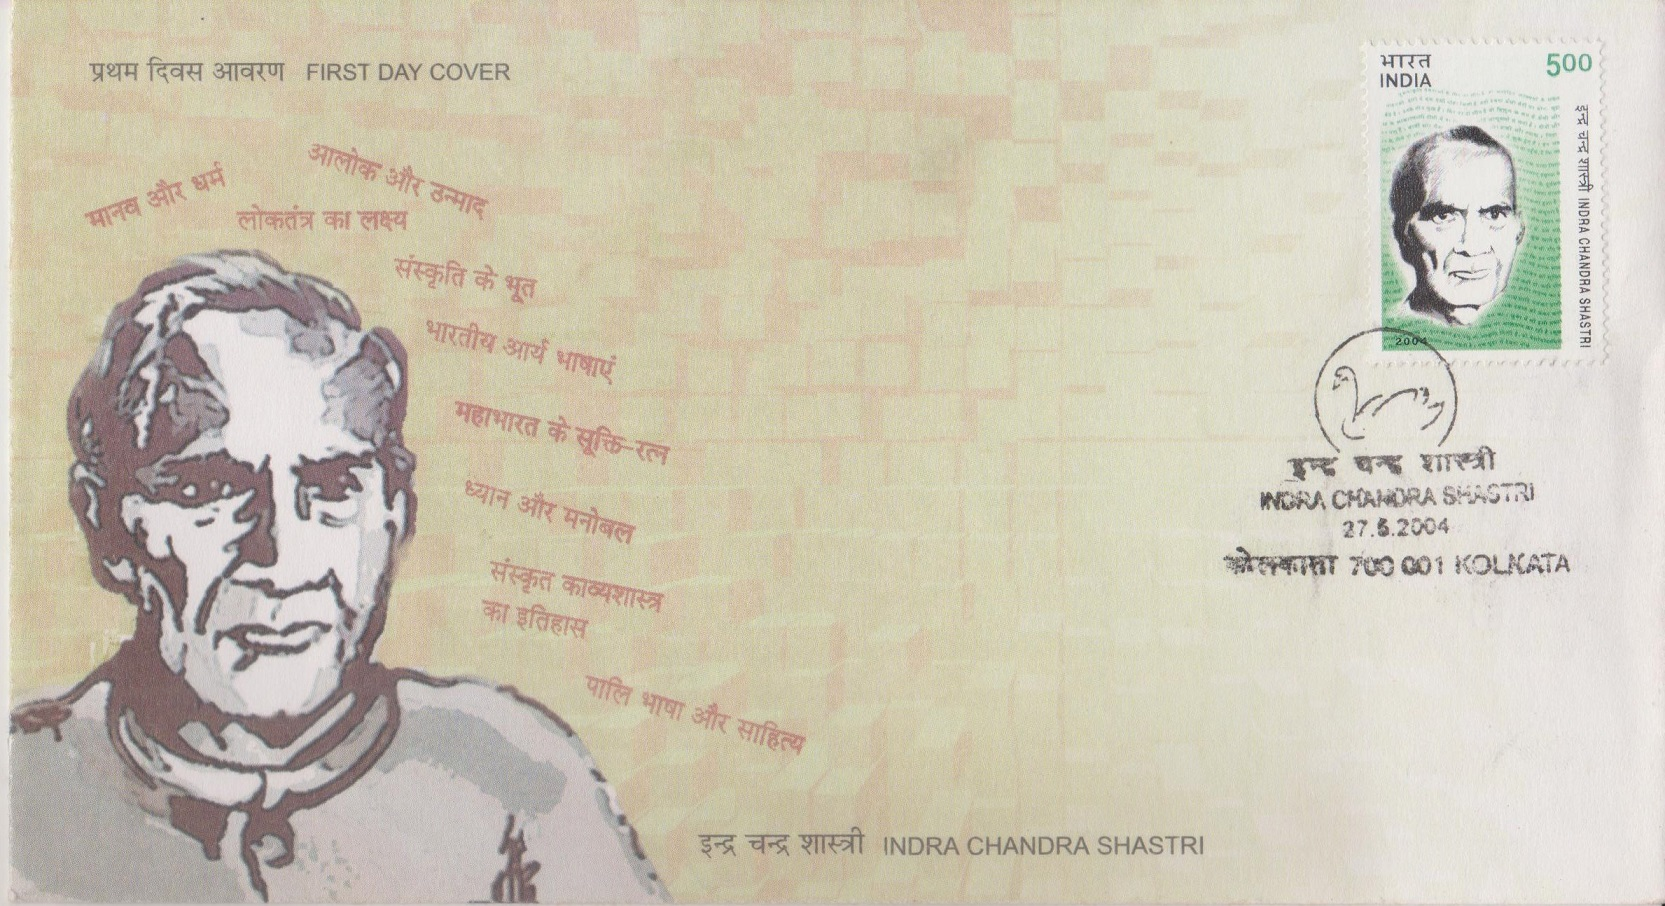 Jain Philosophy and Literature